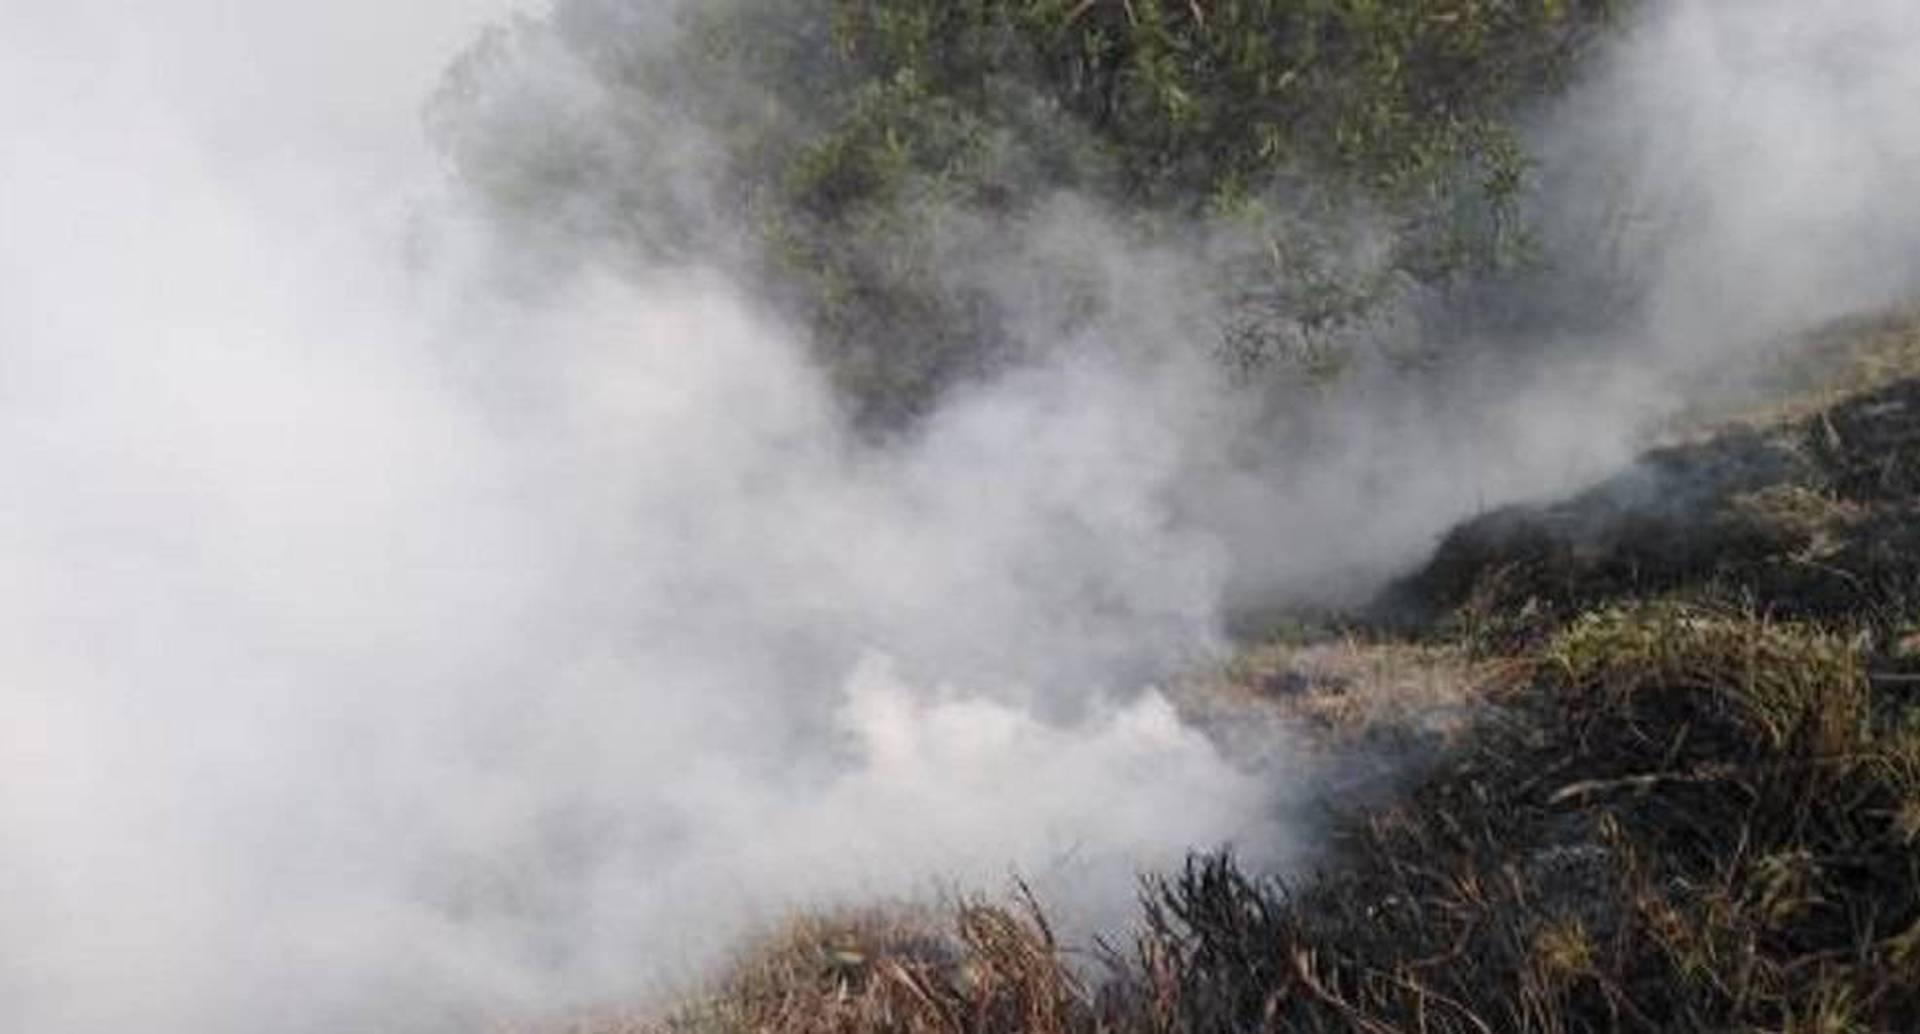 Incendio forestal en Fontibón / Foto: Bomberos Bogotá